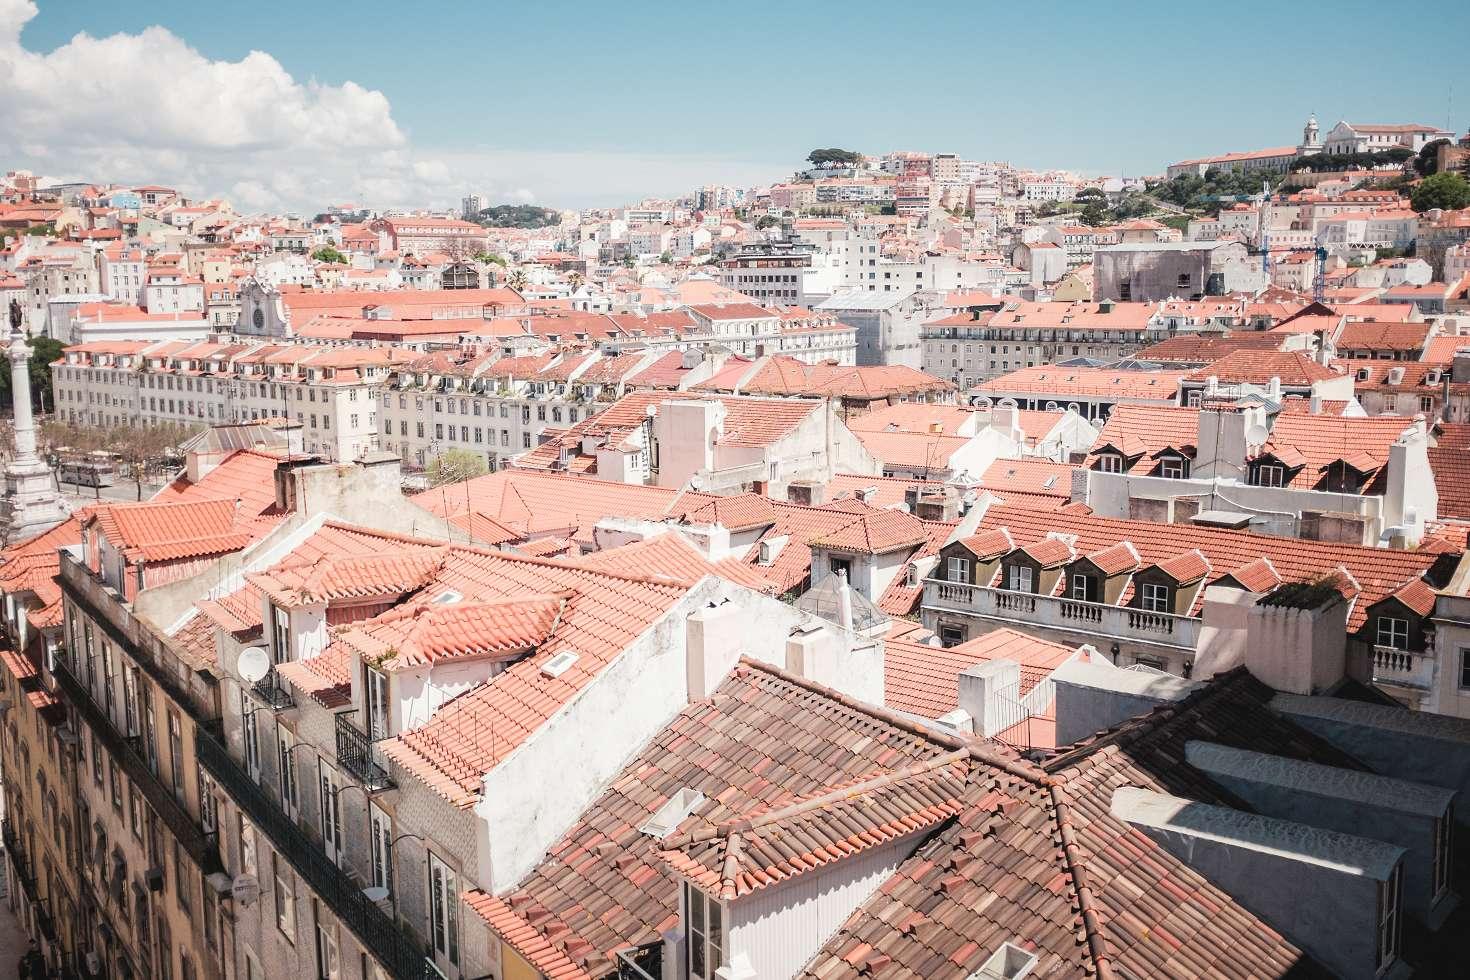 Valencia-Lissabon-Vigo-Stonehenge (31)